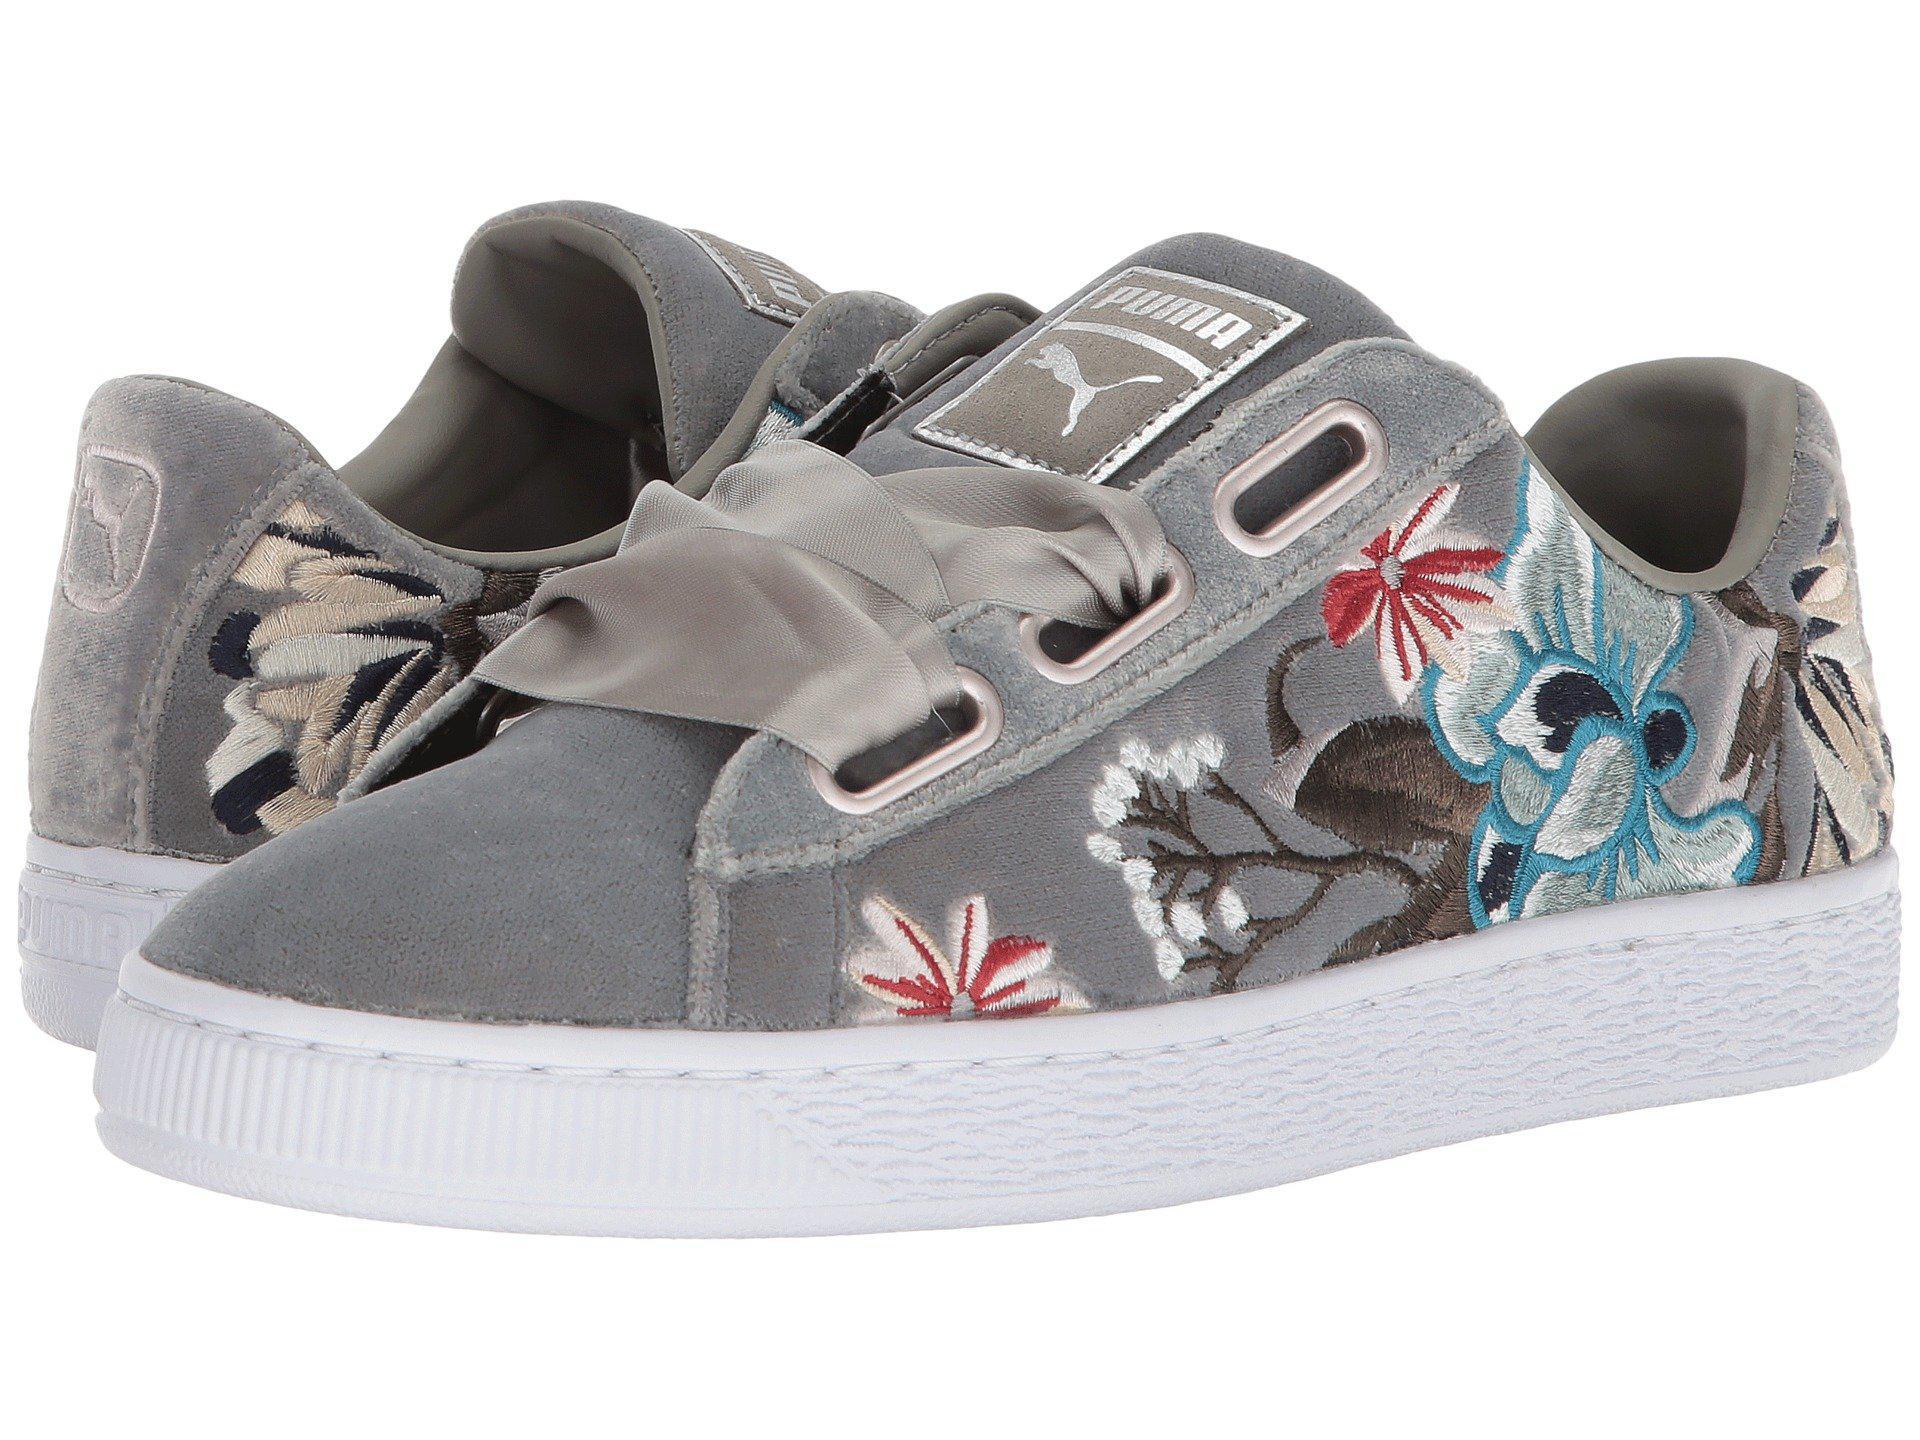 PUMA BASKET Heart heyper EMB Rock Ridge Sneaker Scarpe